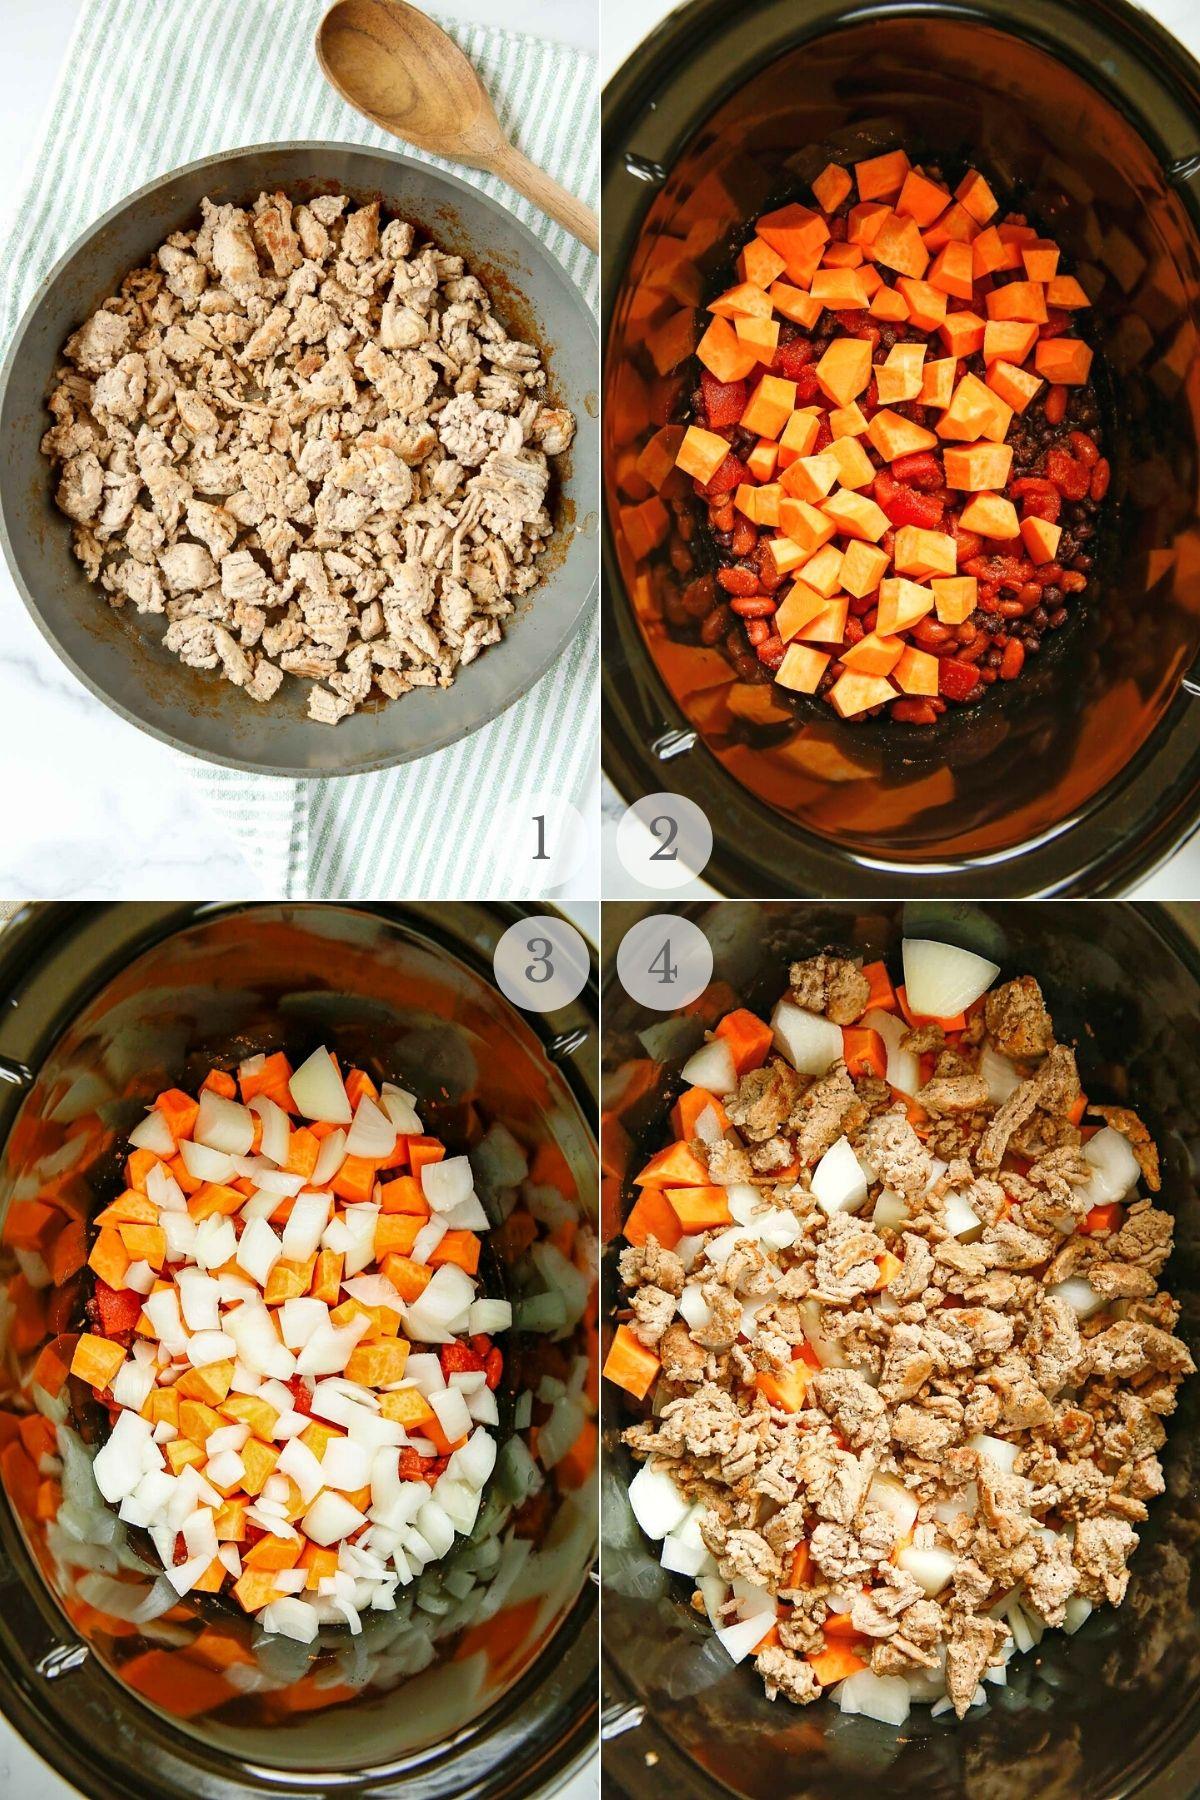 slow cooker turkey chili recipe steps 1-4